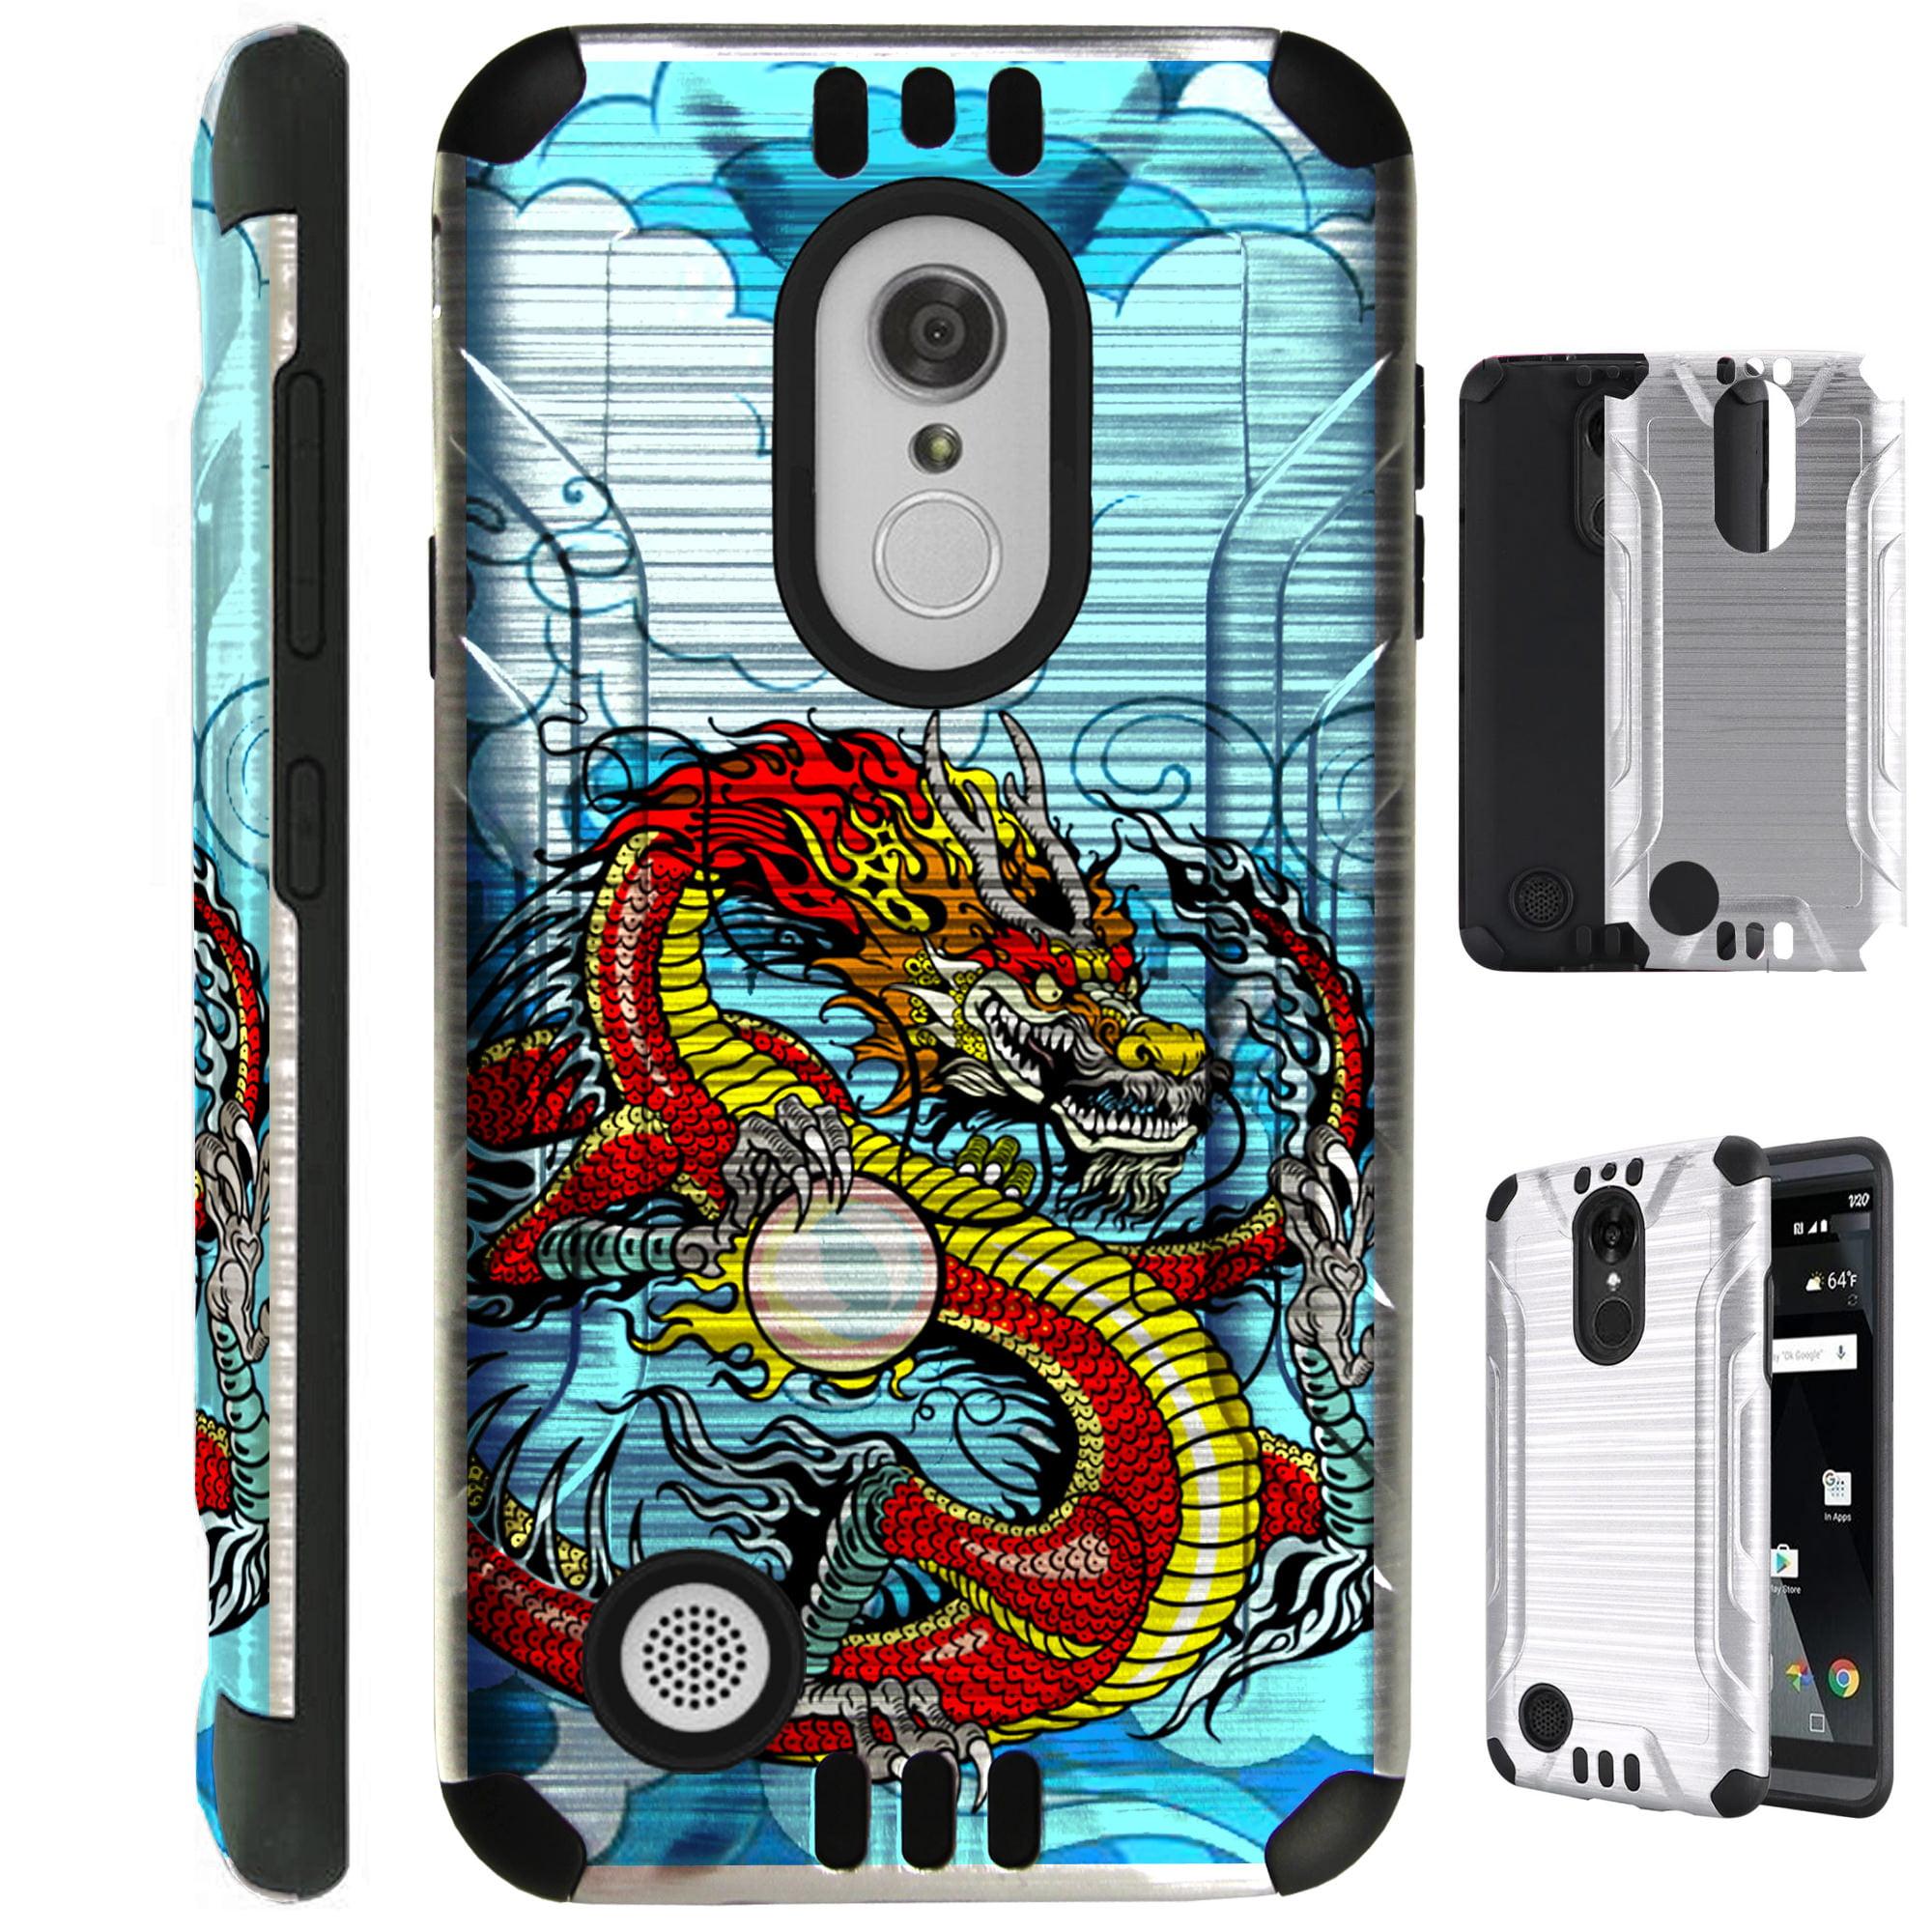 For LG K20 Plus / LG K20 V LV5 / LG Harmony / LG Grace / LG K10 (2017) Case Brushed Metal Texture Hybrid TPU Metallic Guard Phone Cover (Red Dragon)